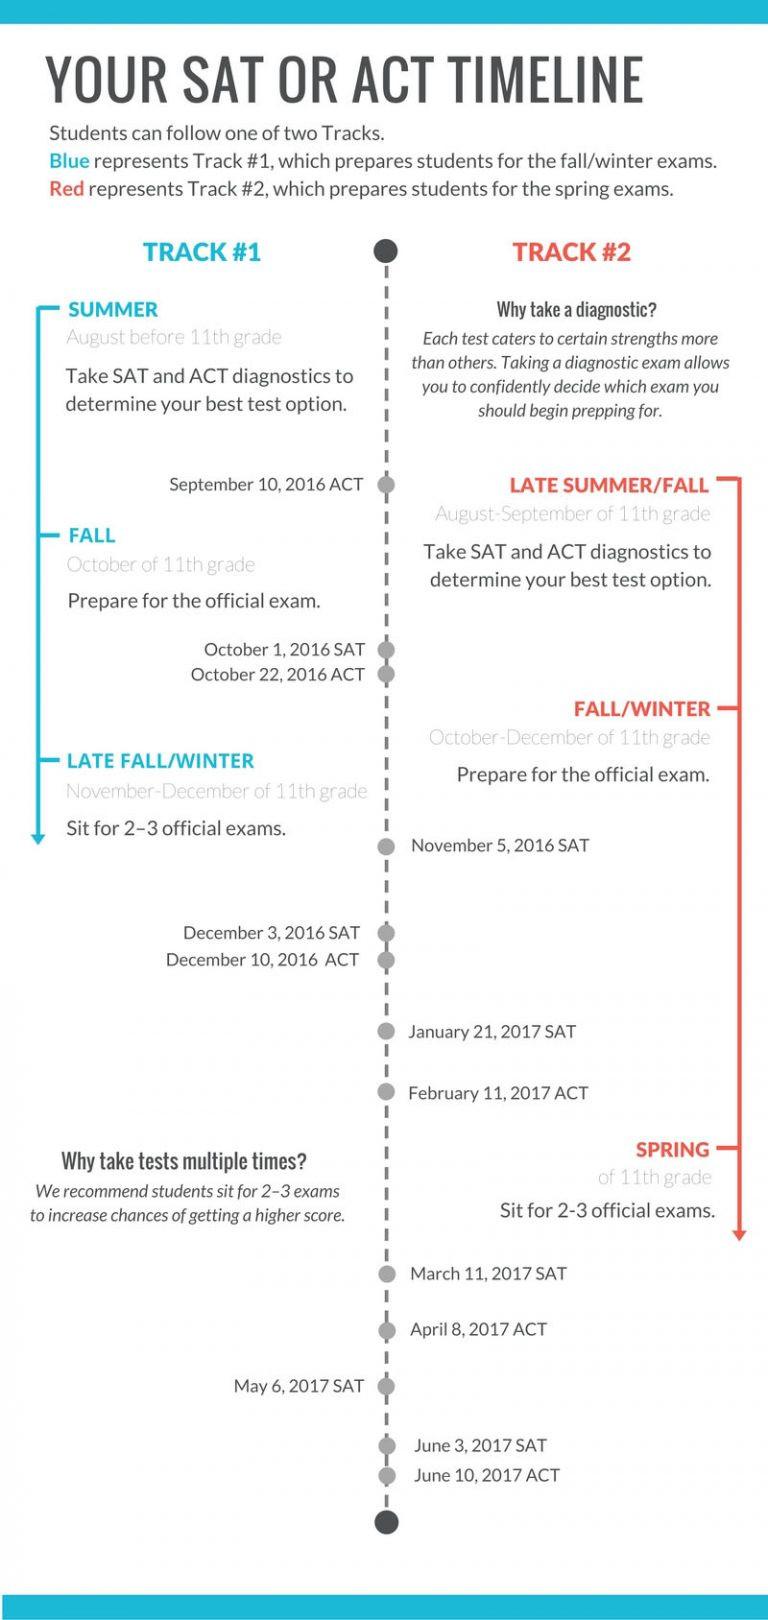 SAT-ACT-Timeline-2016-17_For-Blog-768x1620